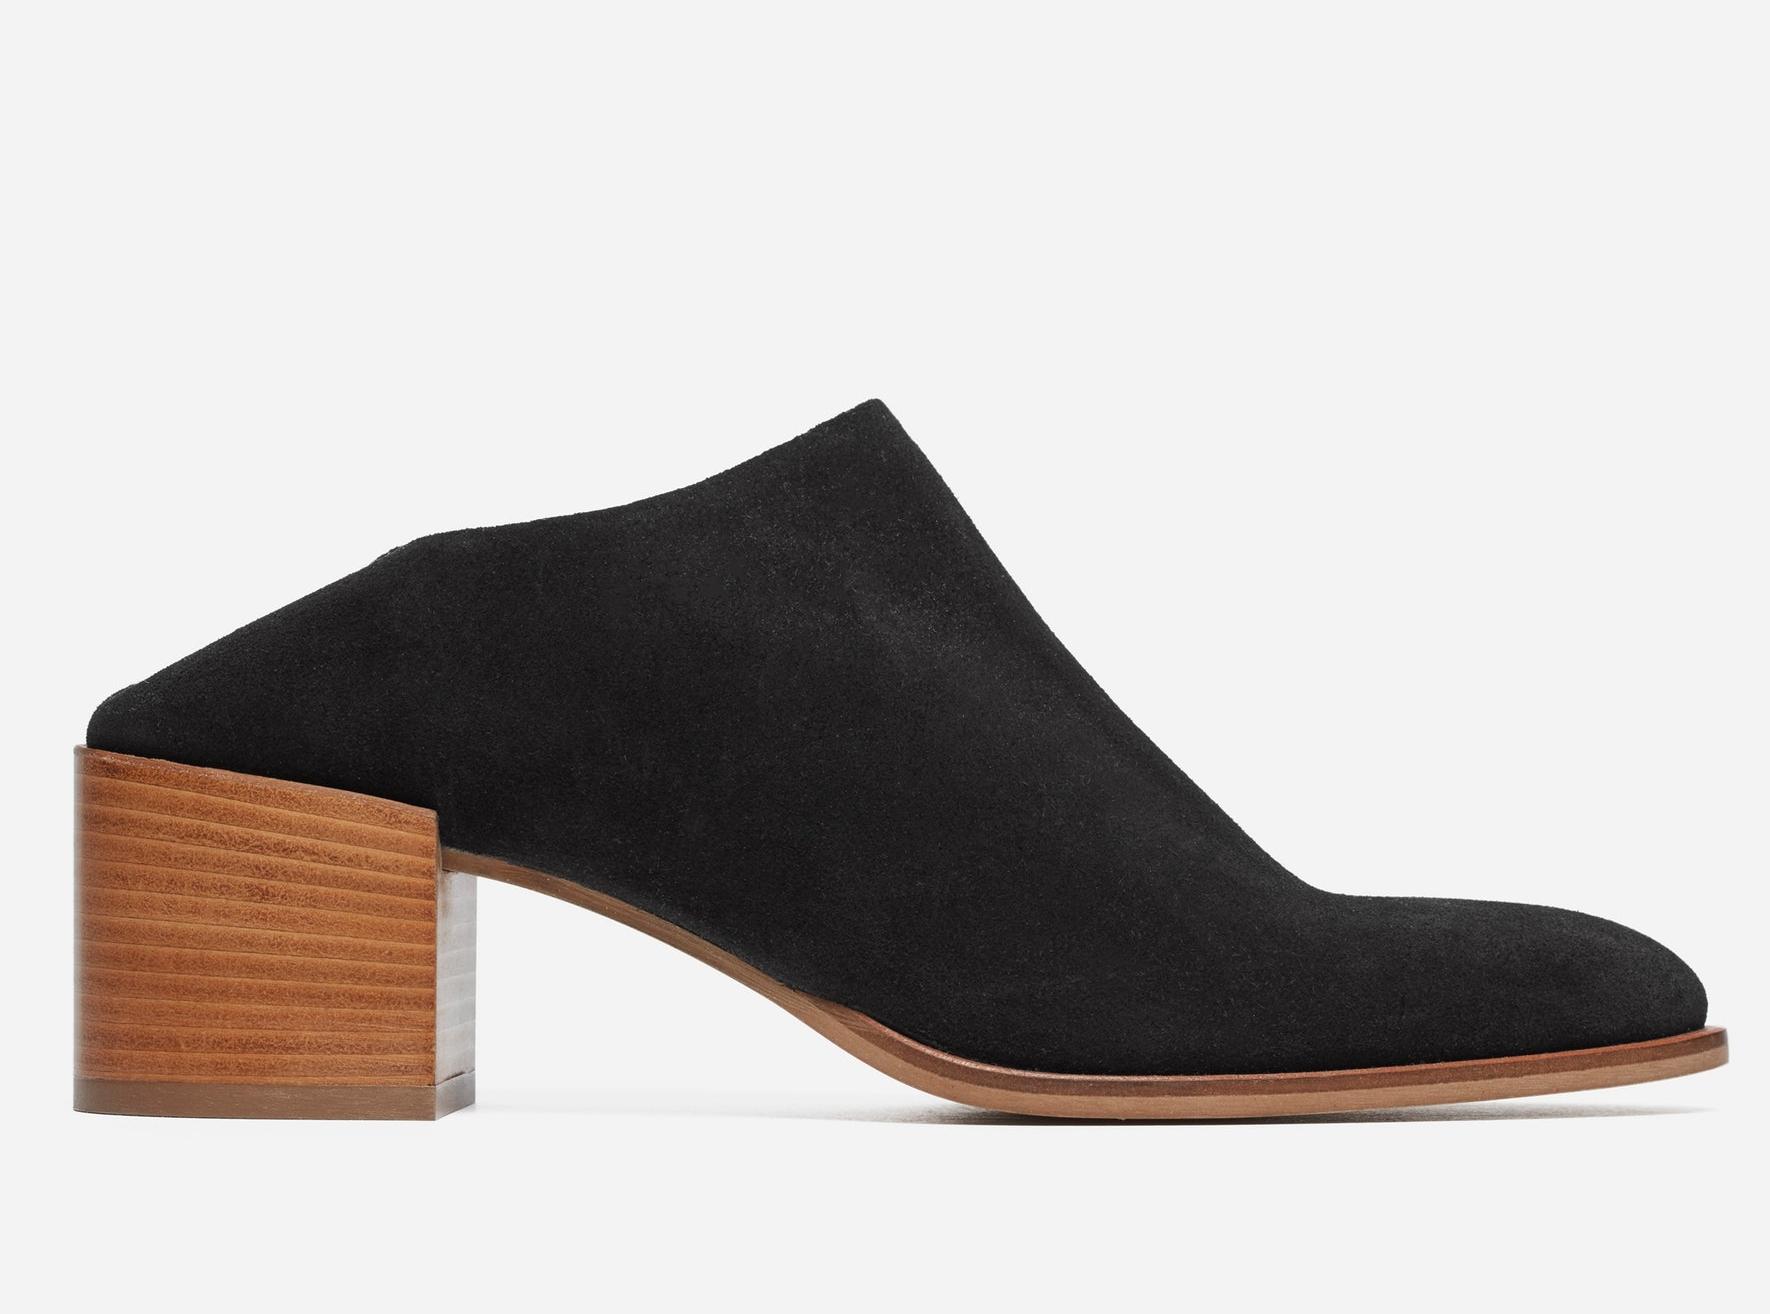 The Suede Heel Mule